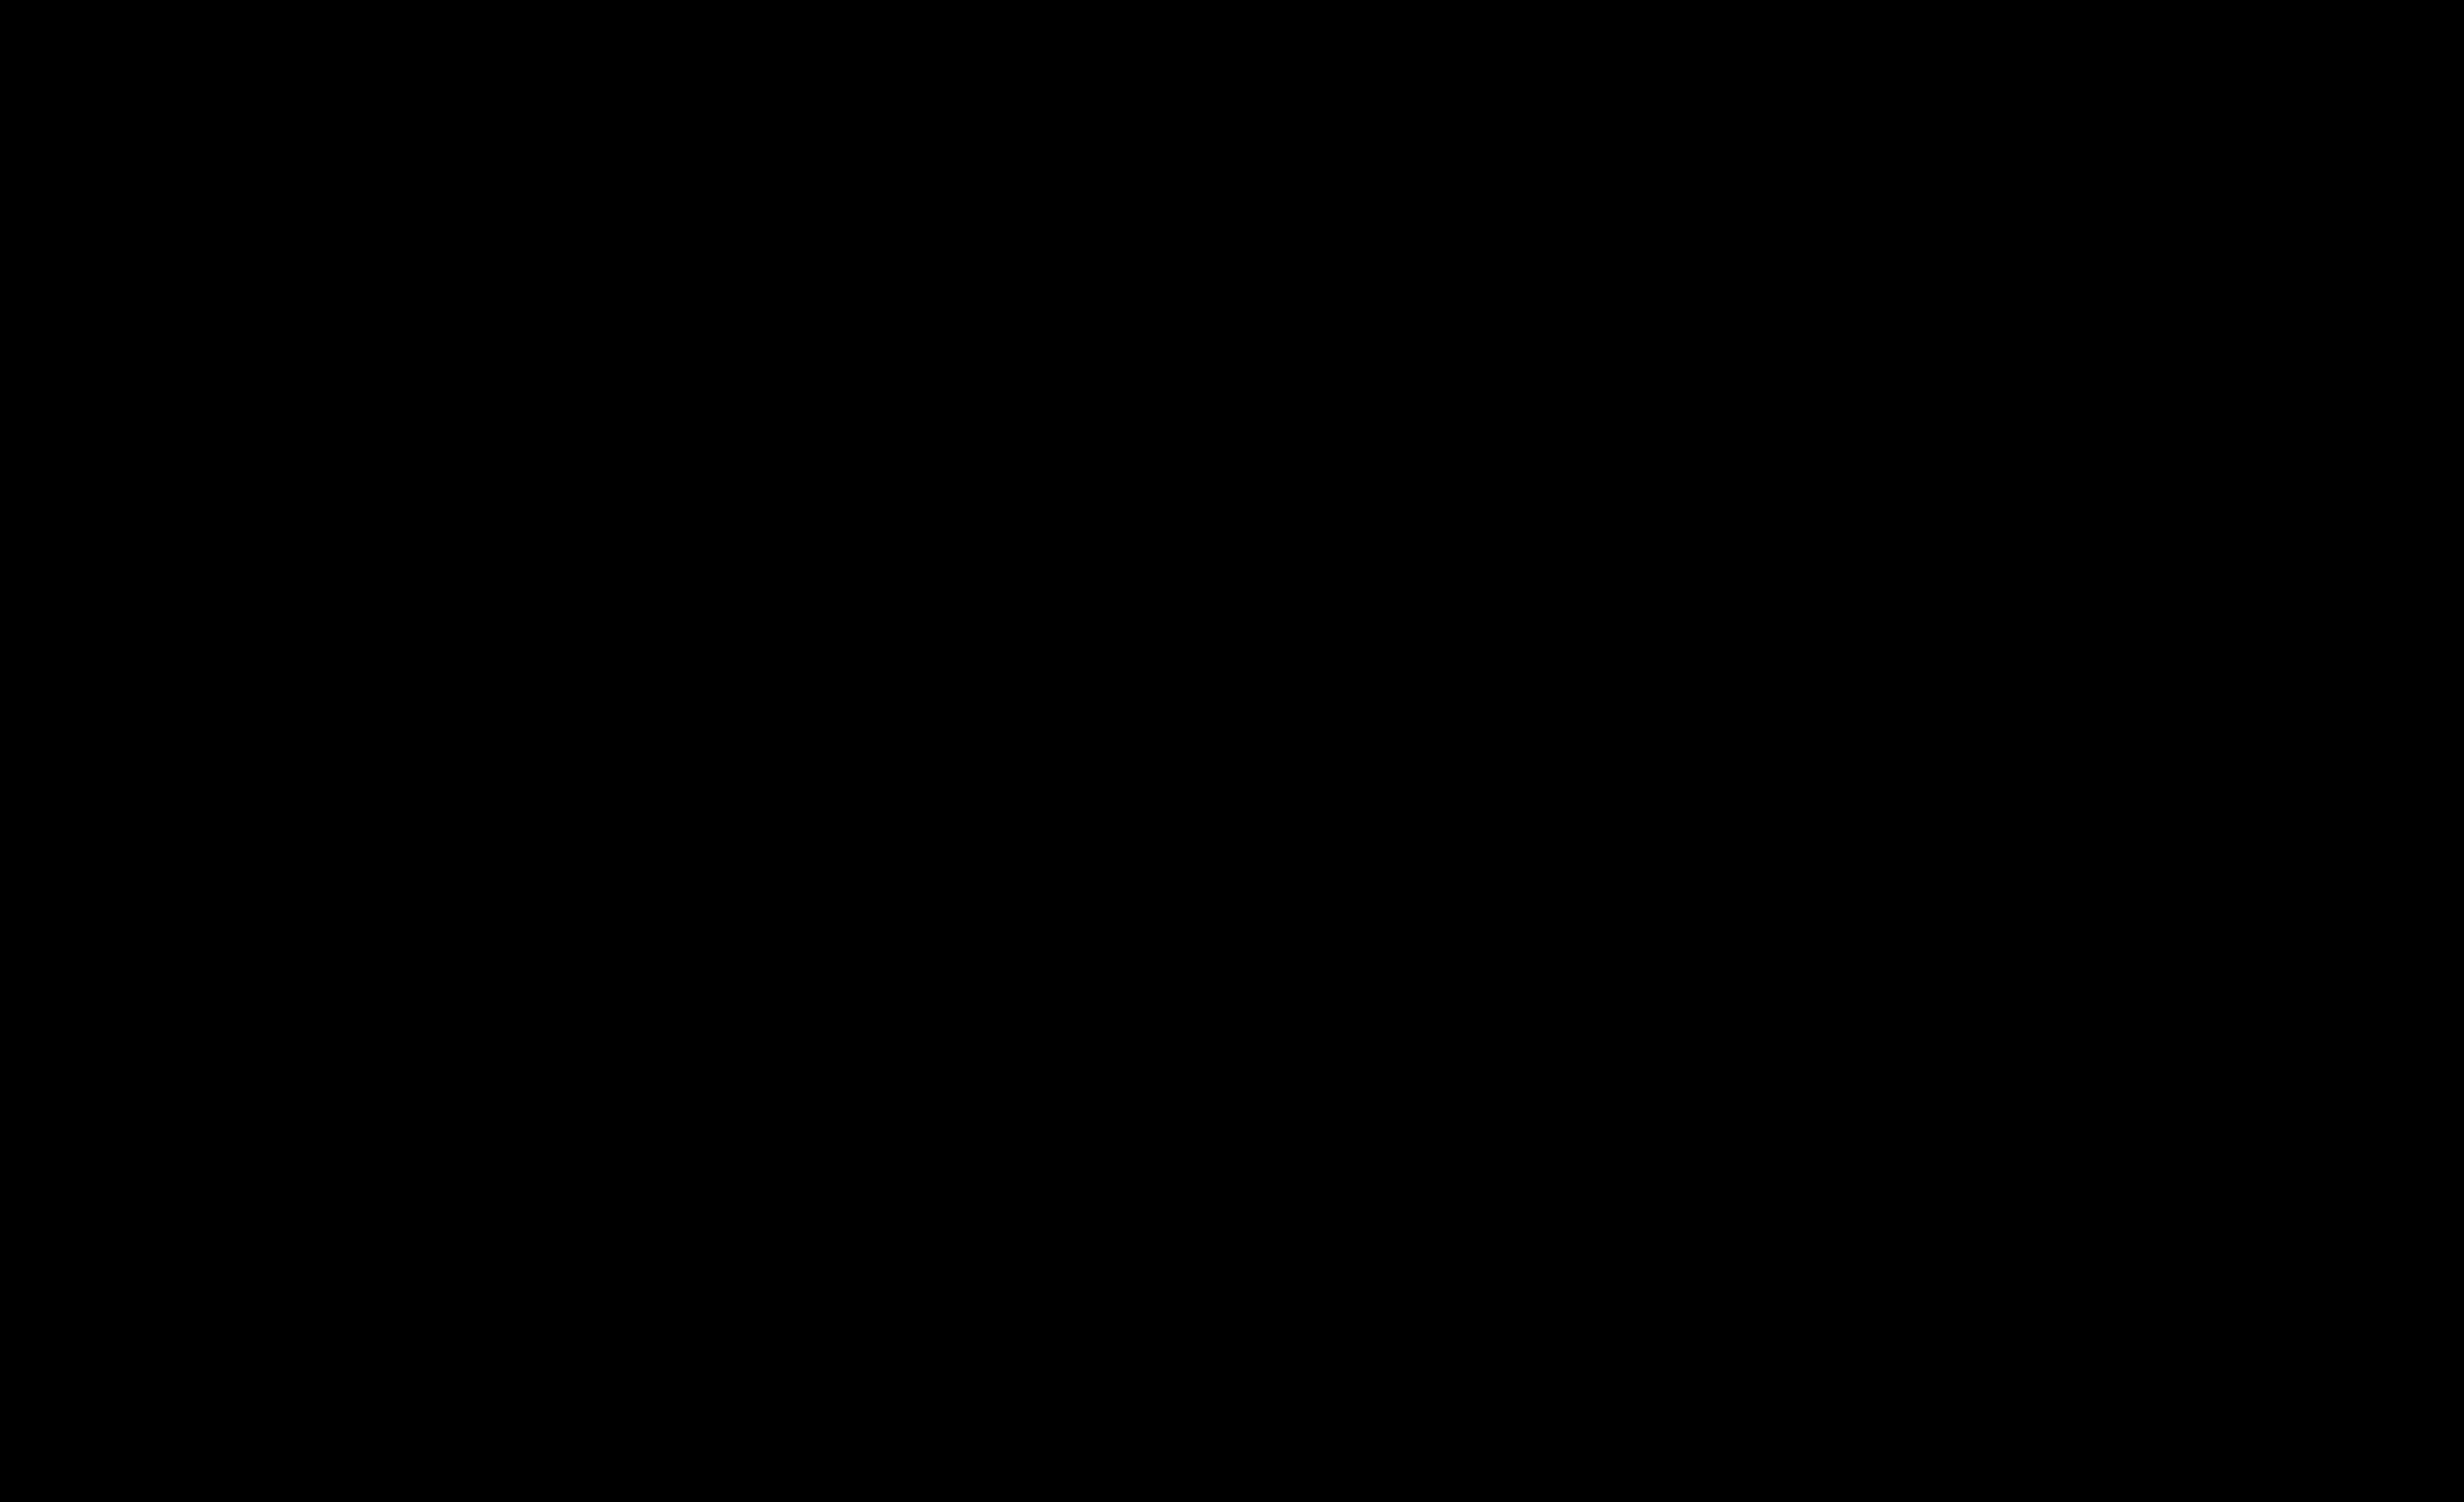 MAL-[NH-dPEG®₄-Glu(TFP ester)]₃-NH-m-dPEG®₂₄